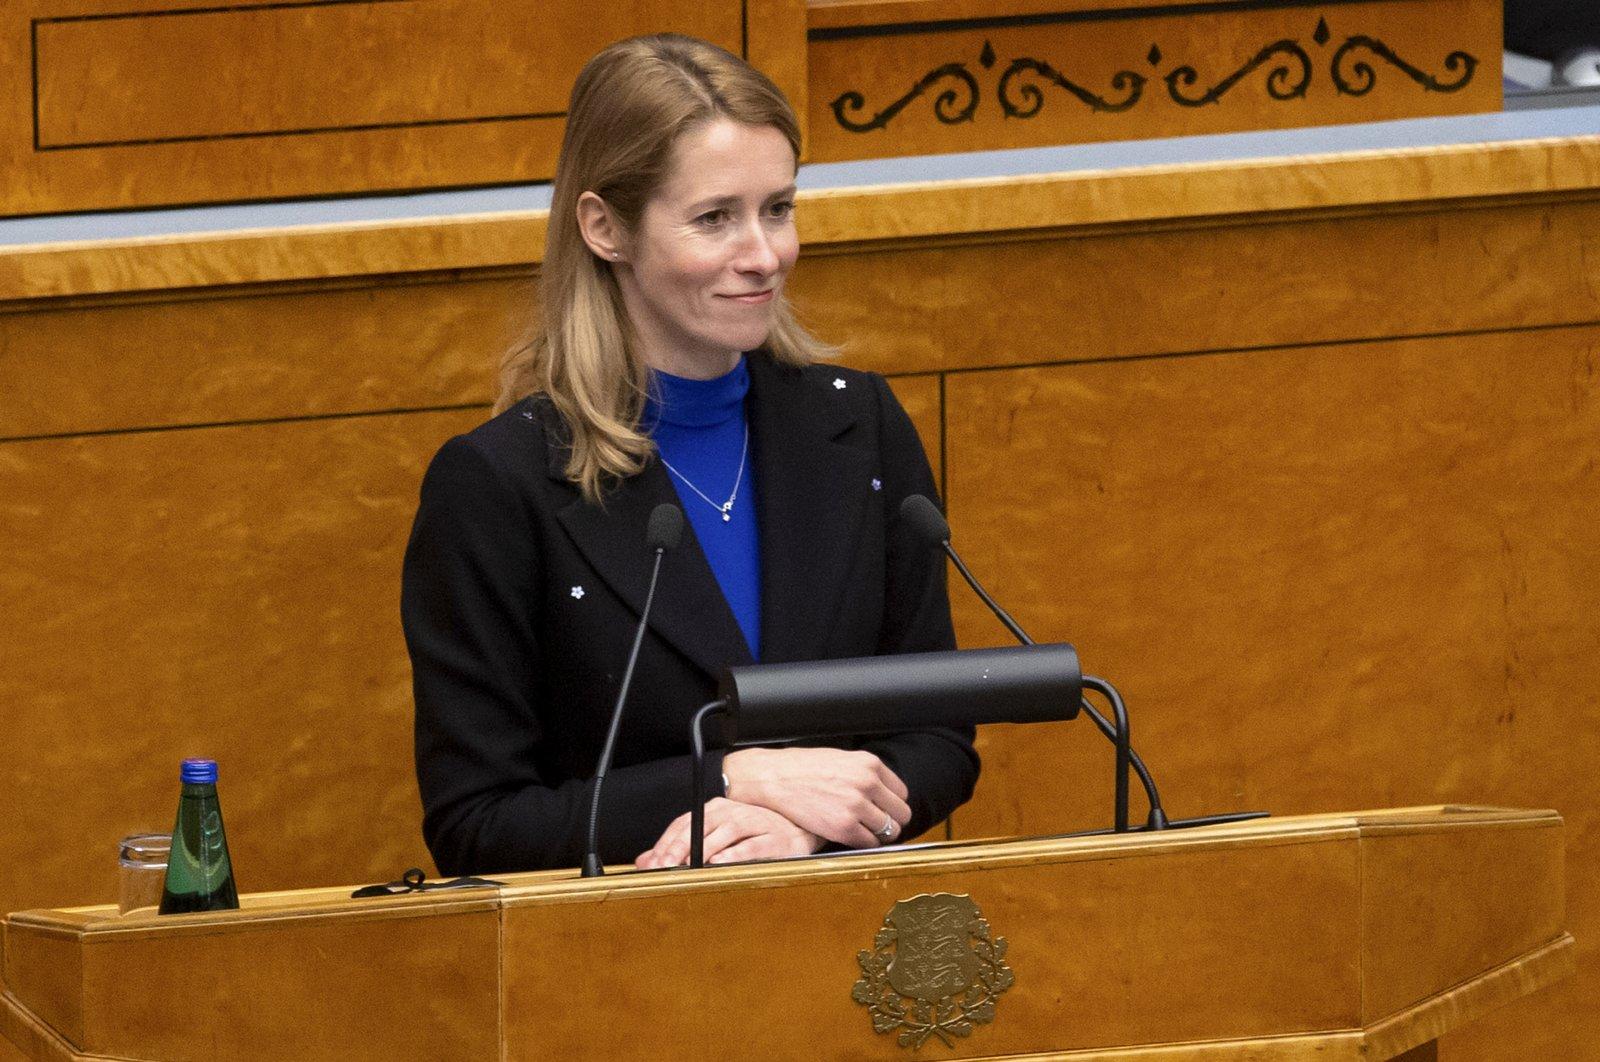 Kaja Kallas is Estonias first female PM | Port Stephens